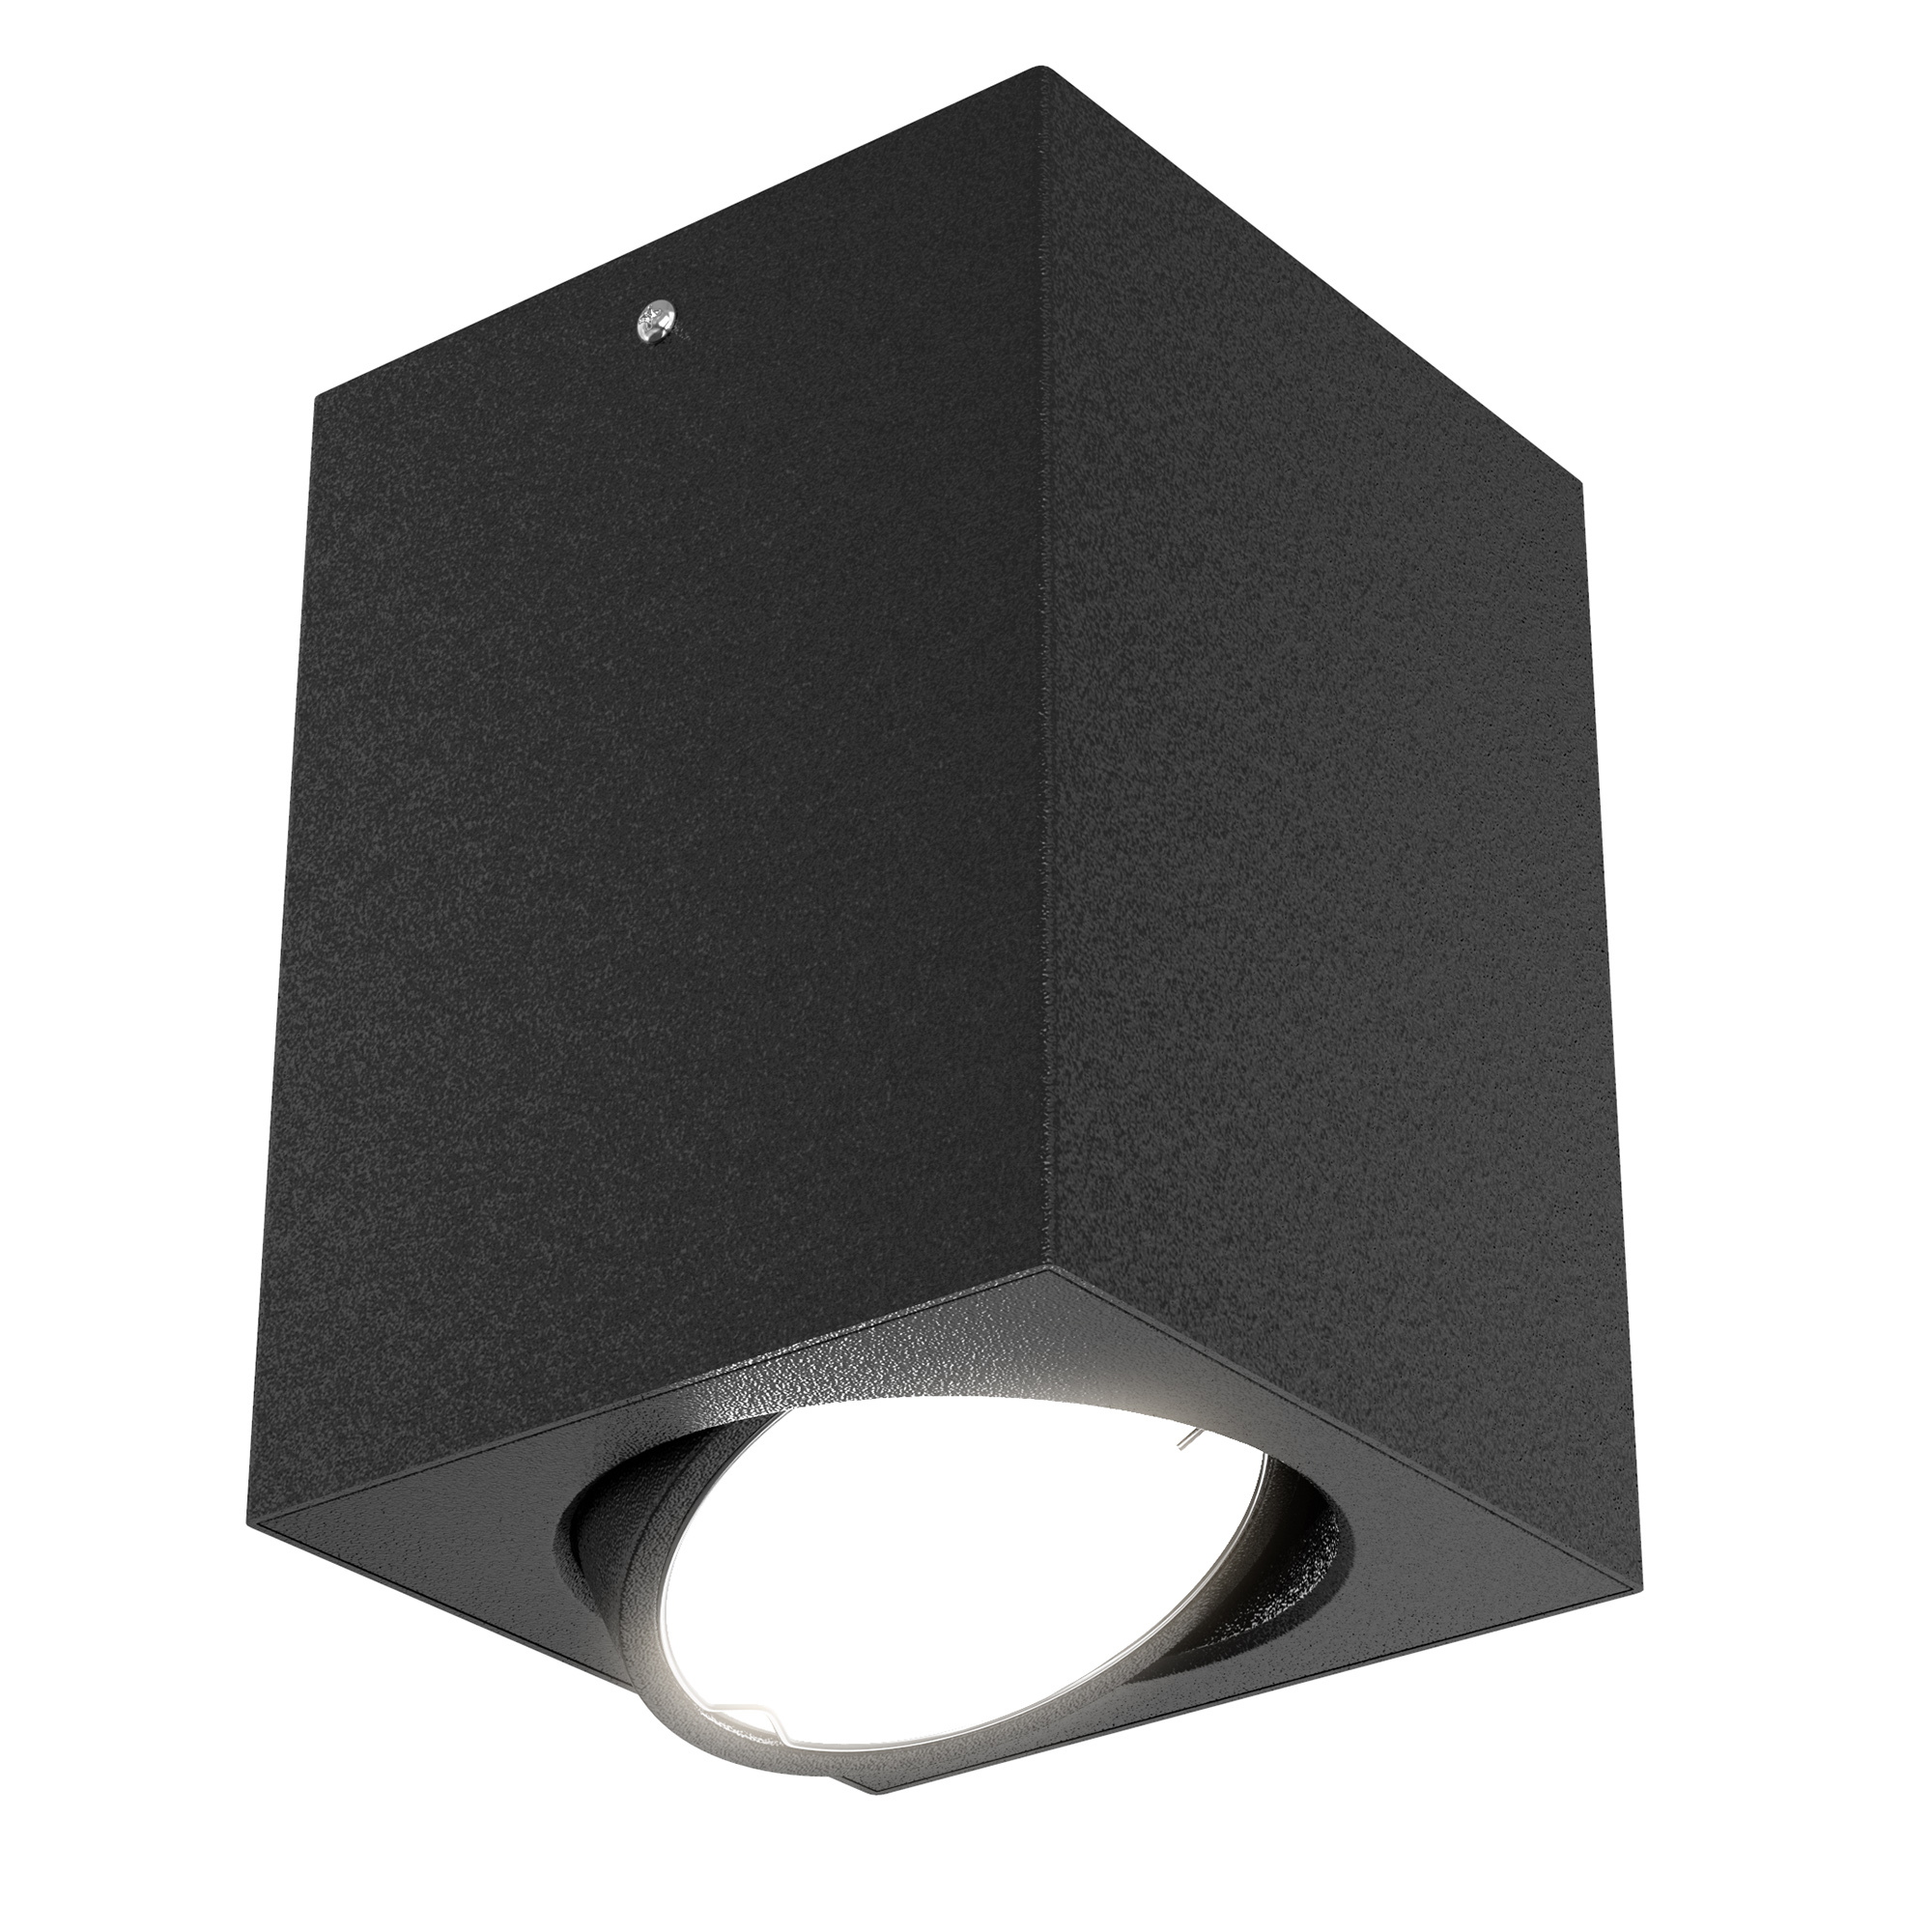 LED Aufbauleuchte, 10,5 cm, 5 W, Schwarz